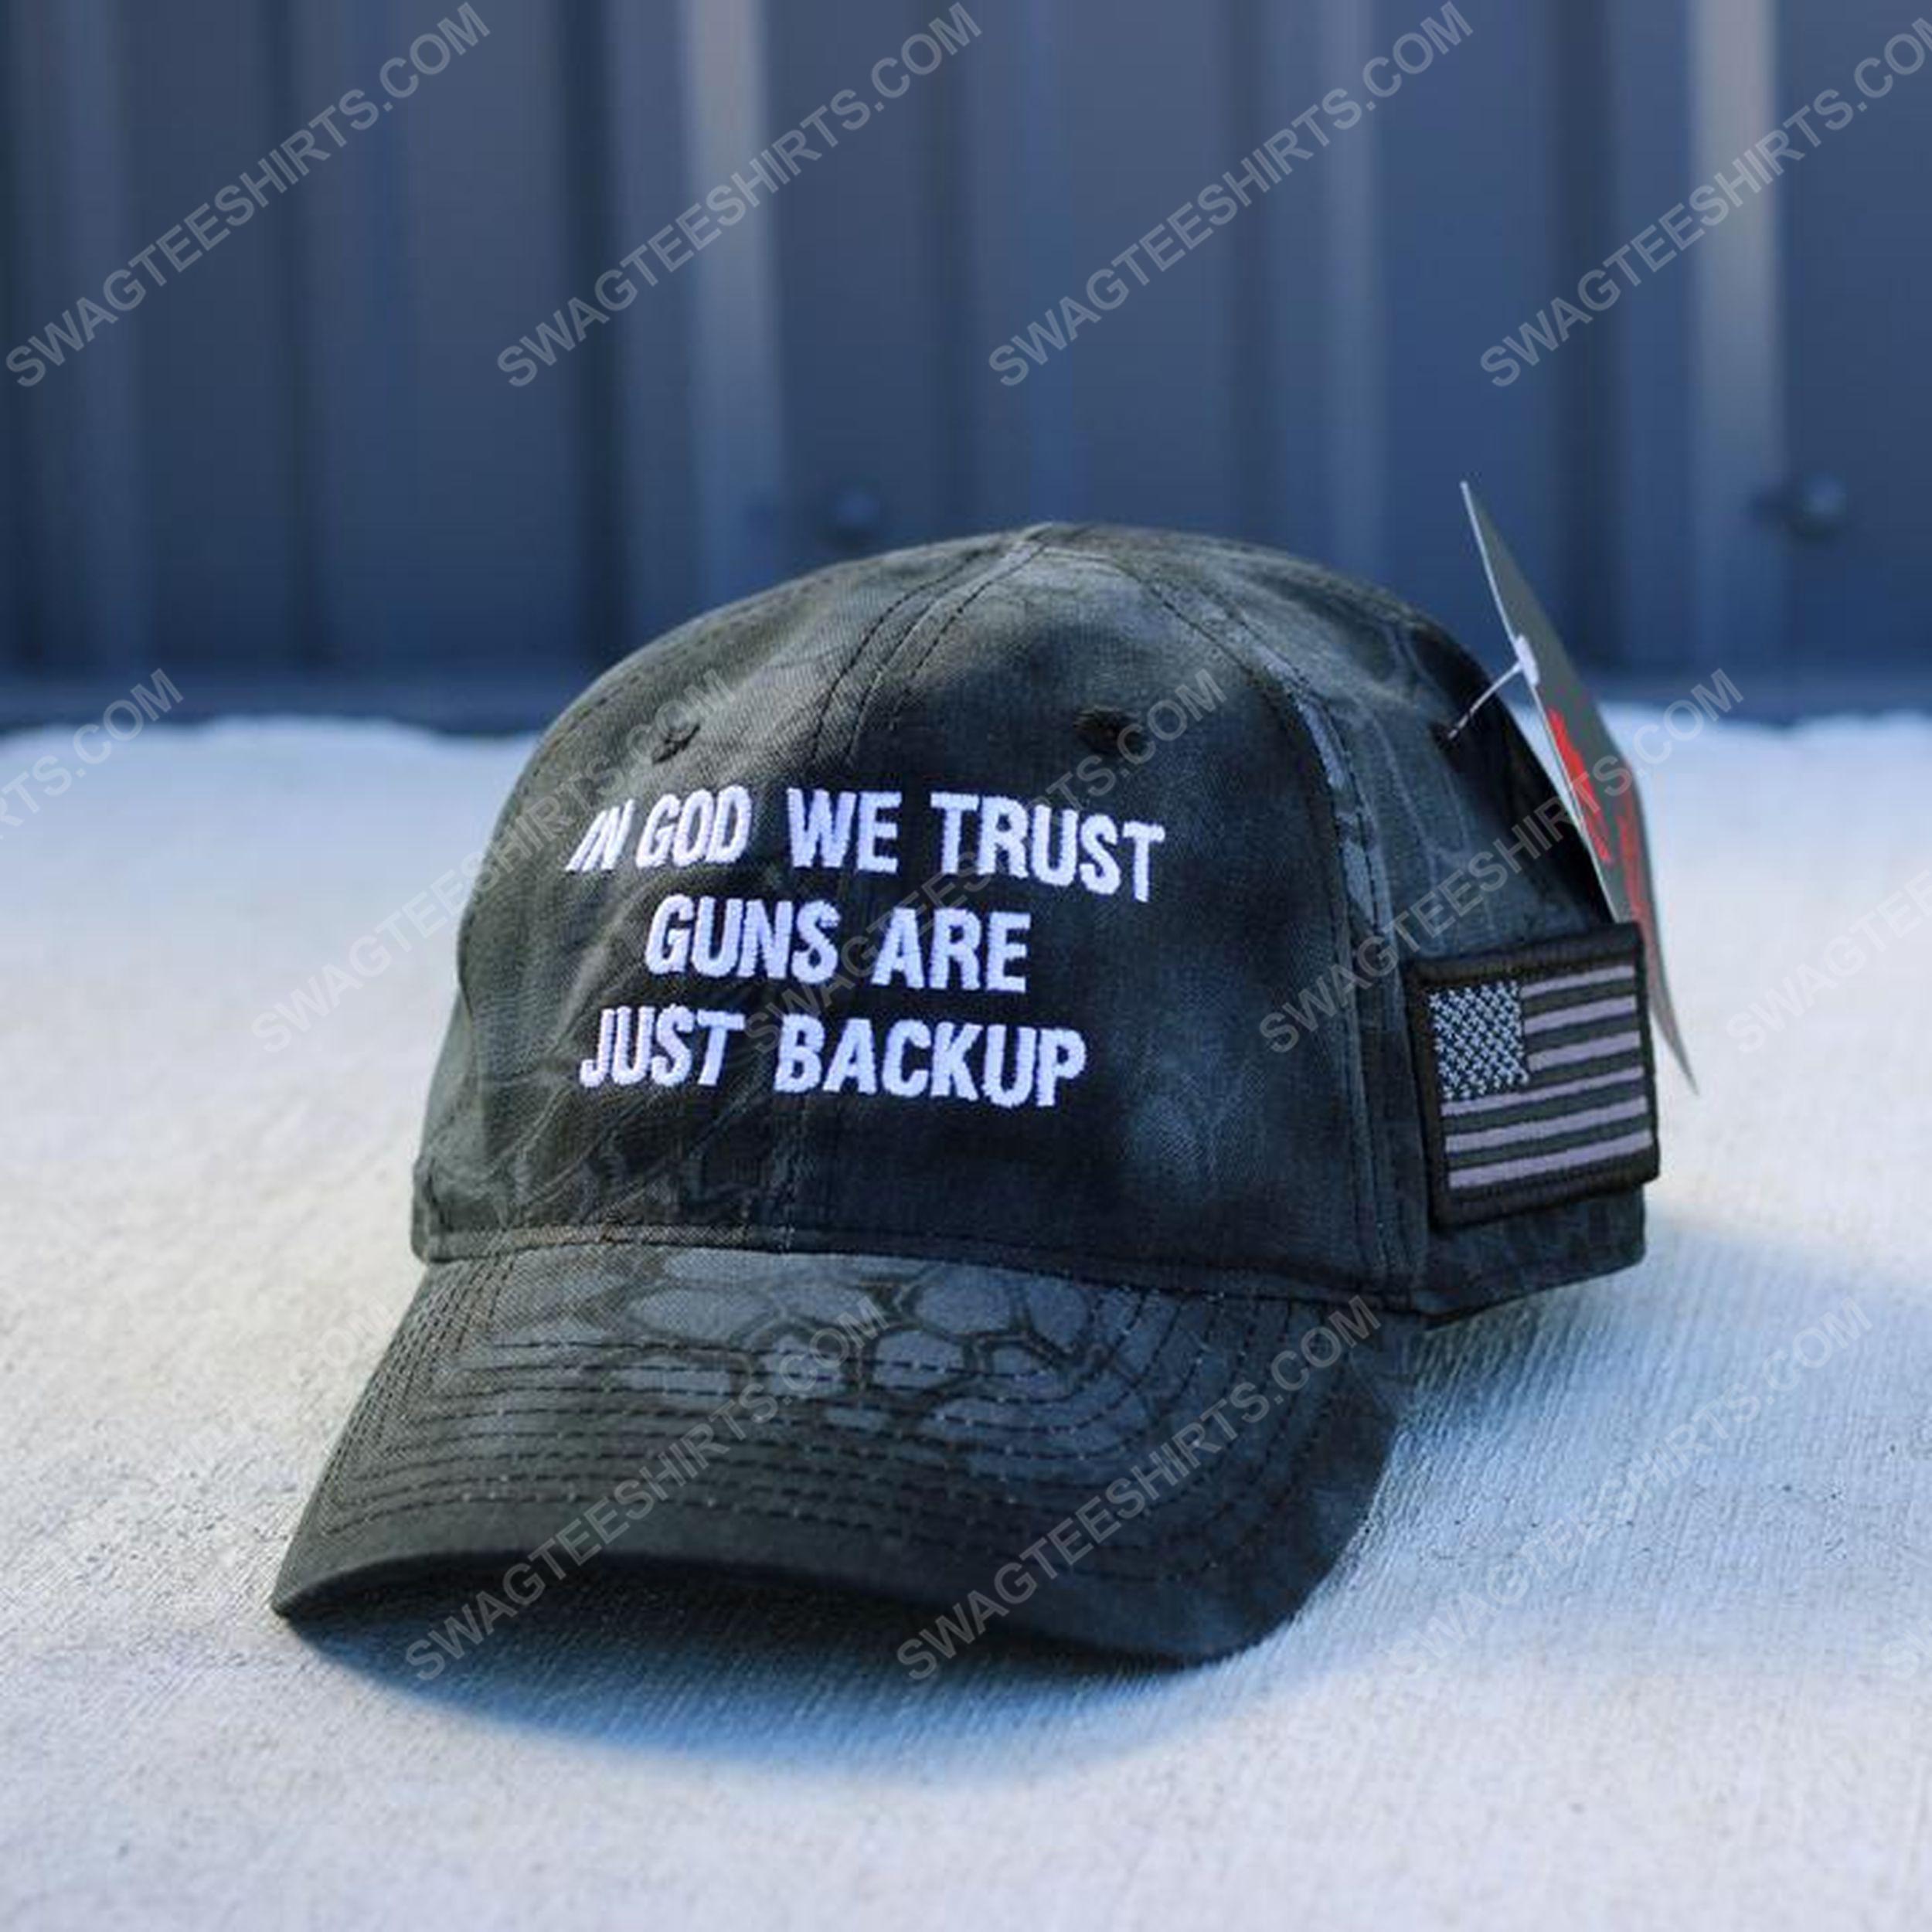 In God we trust guns are just backup full print classic hat 1 - Copy (2)